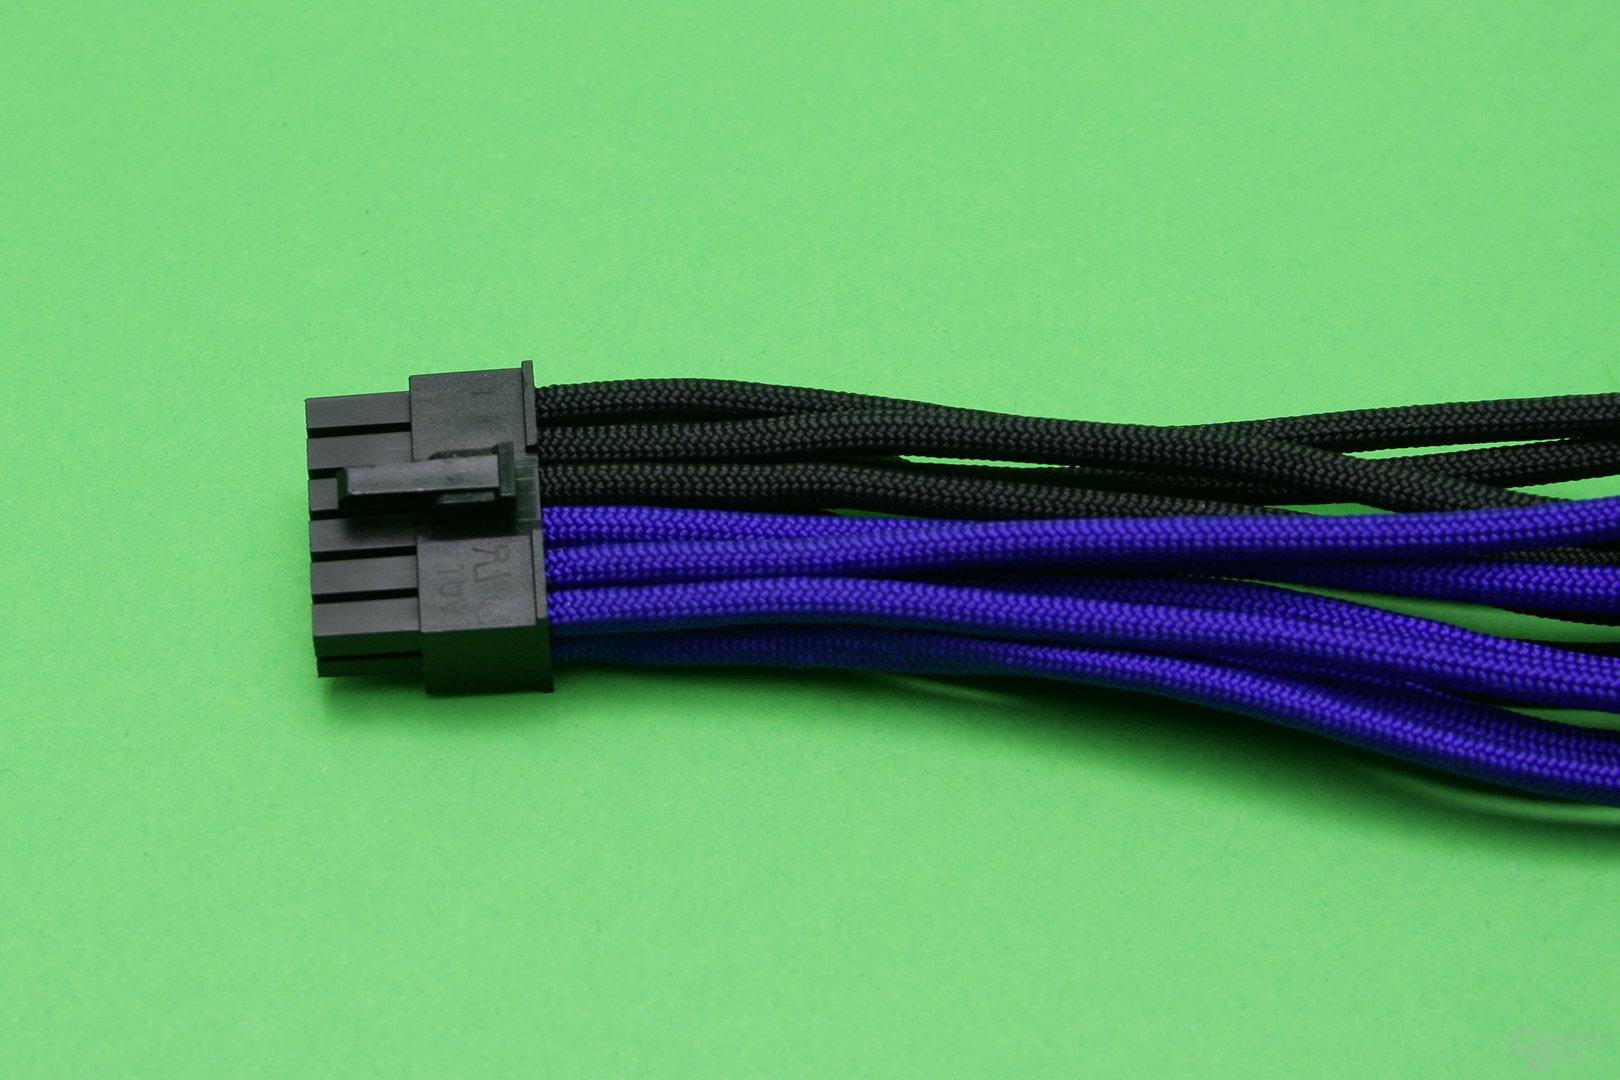 PCIe-Anschlusskabel selbst gesleevt: Netzteilstecker